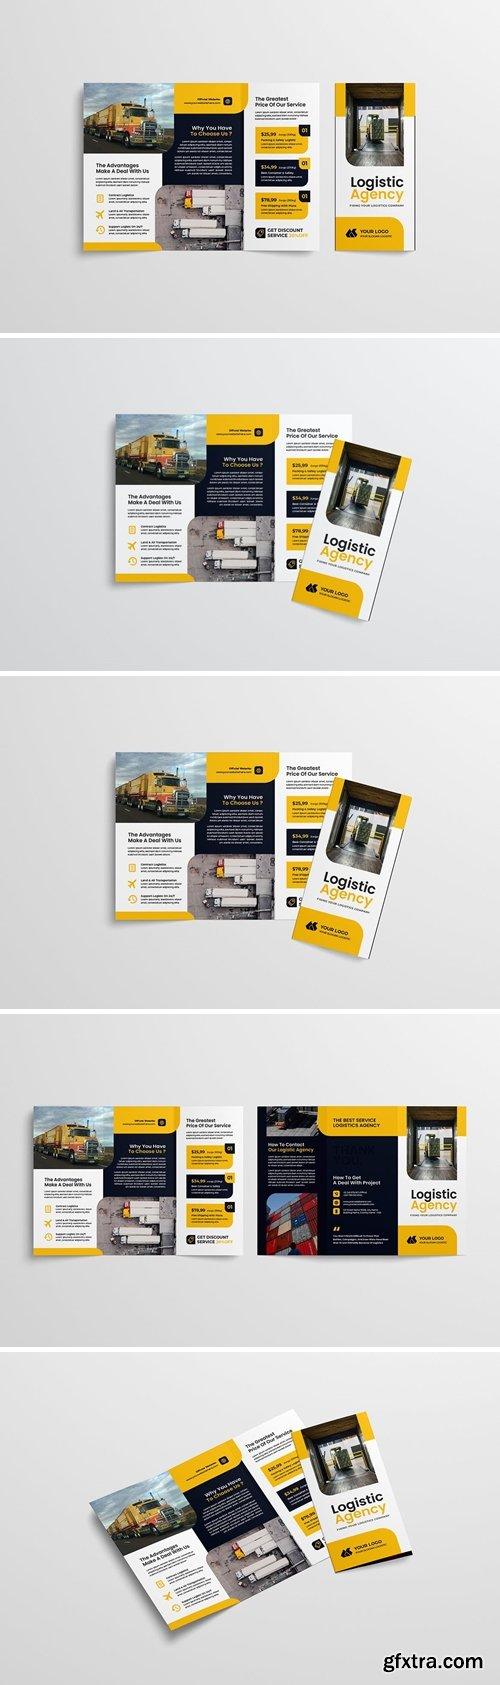 Logistic Trifold Brochure